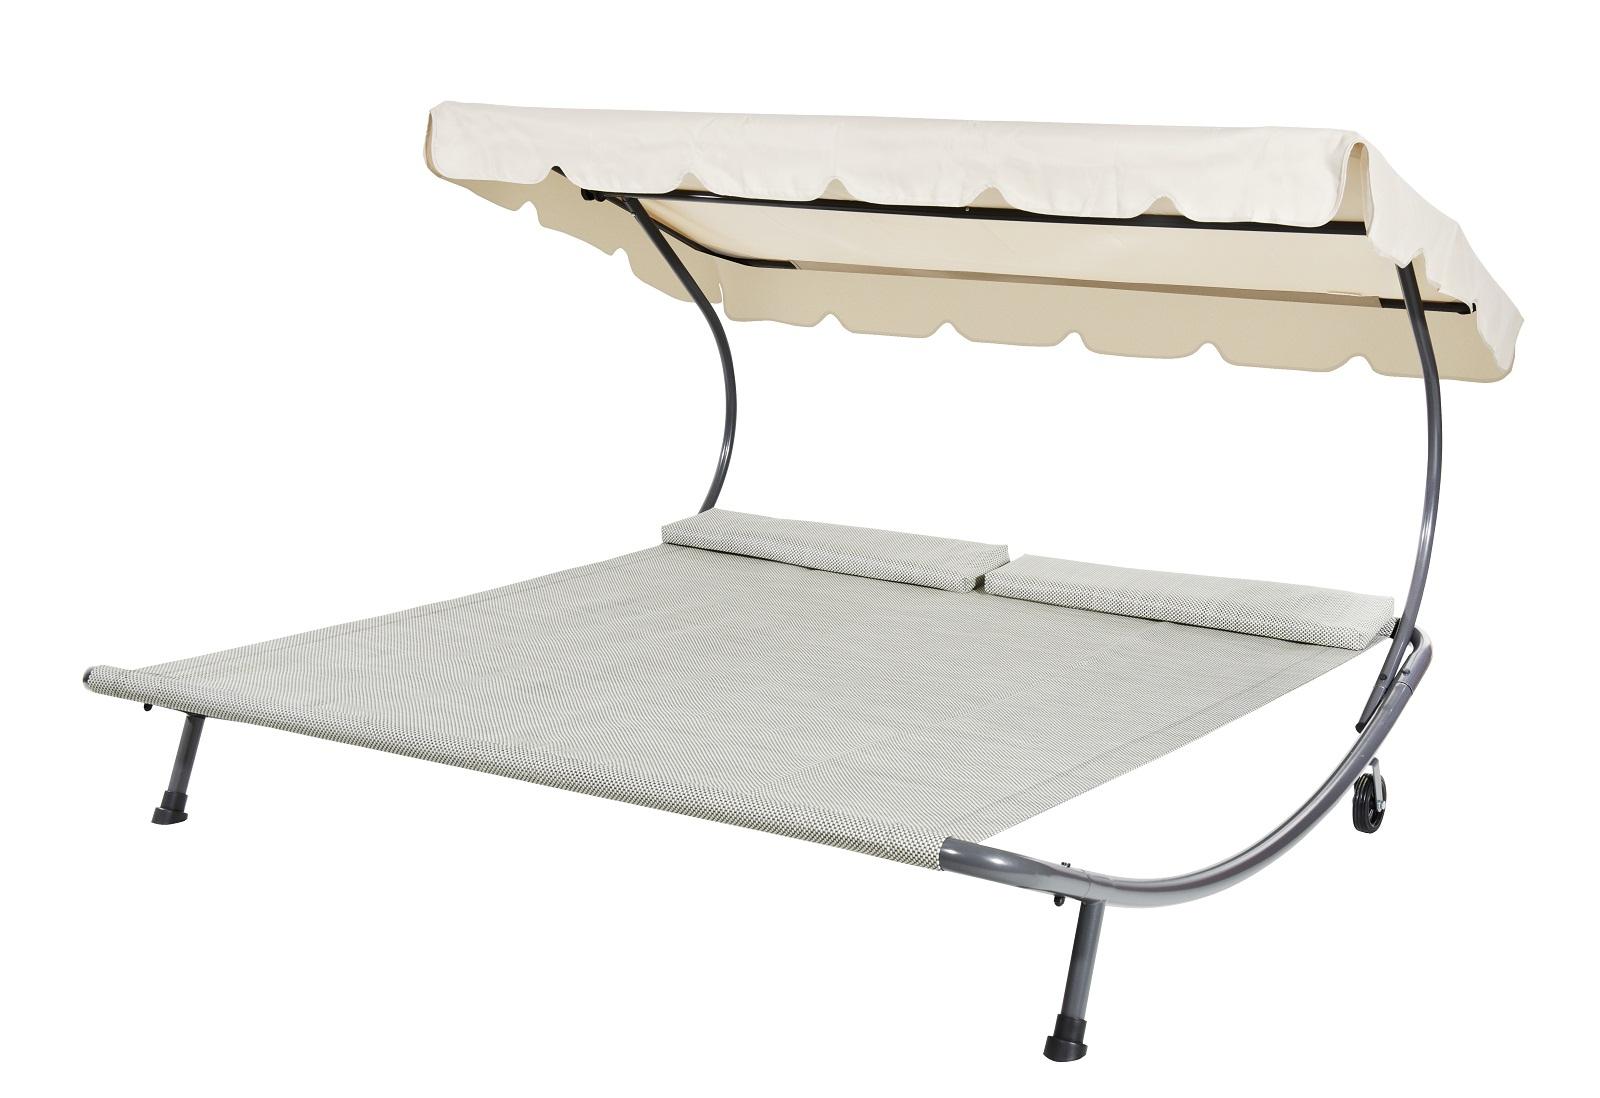 leco doppelliege 200 x 200 cm relaxliege gartenliege liege sommerliege ebay. Black Bedroom Furniture Sets. Home Design Ideas